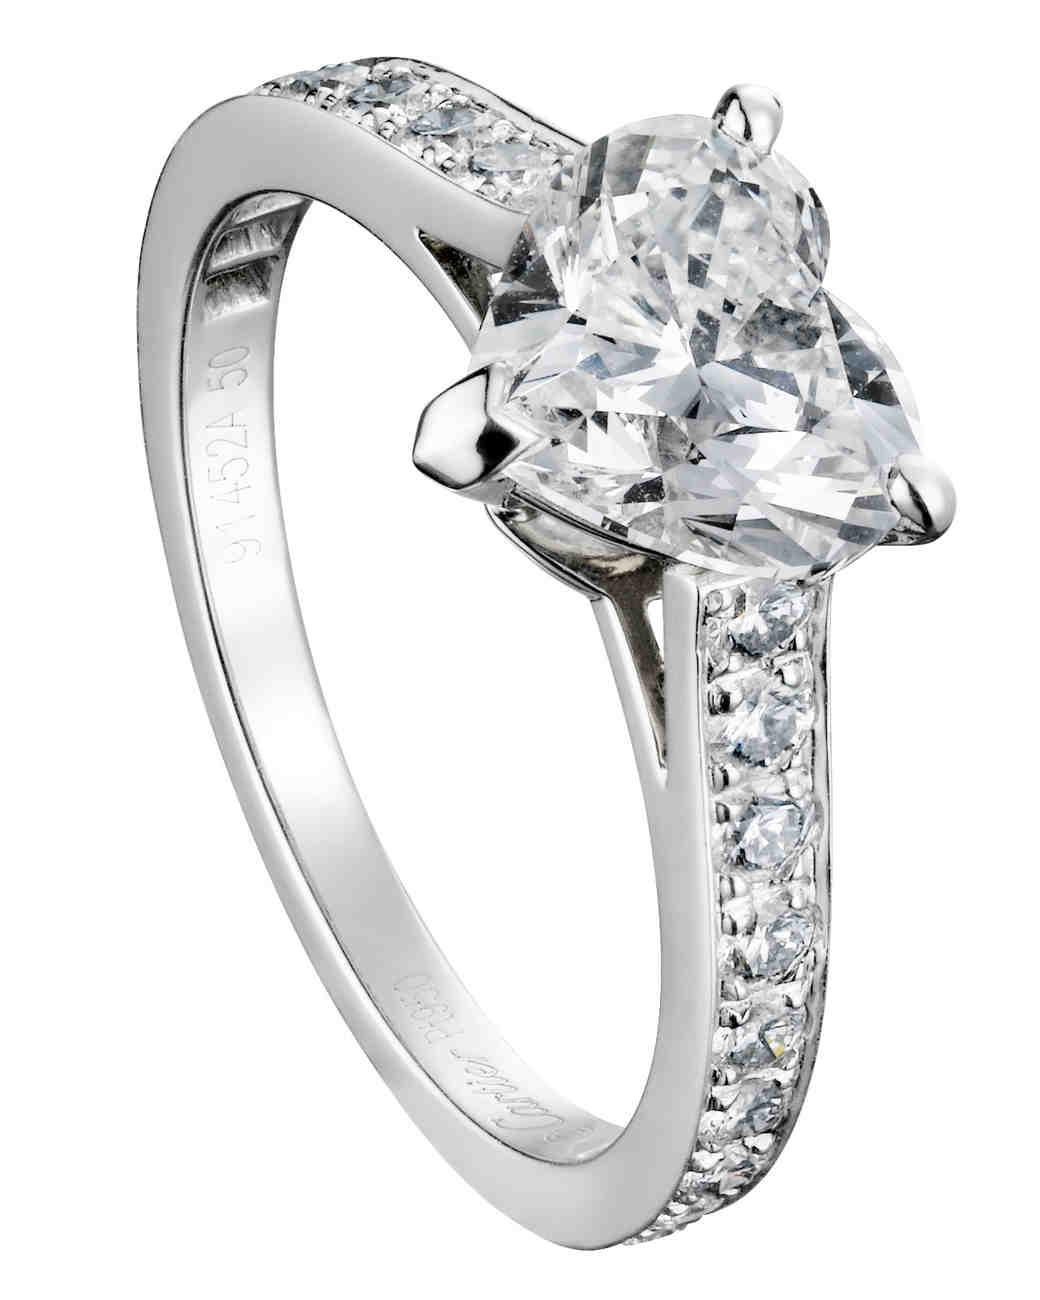 HeartShaped Engagement Rings Martha Stewart Weddings